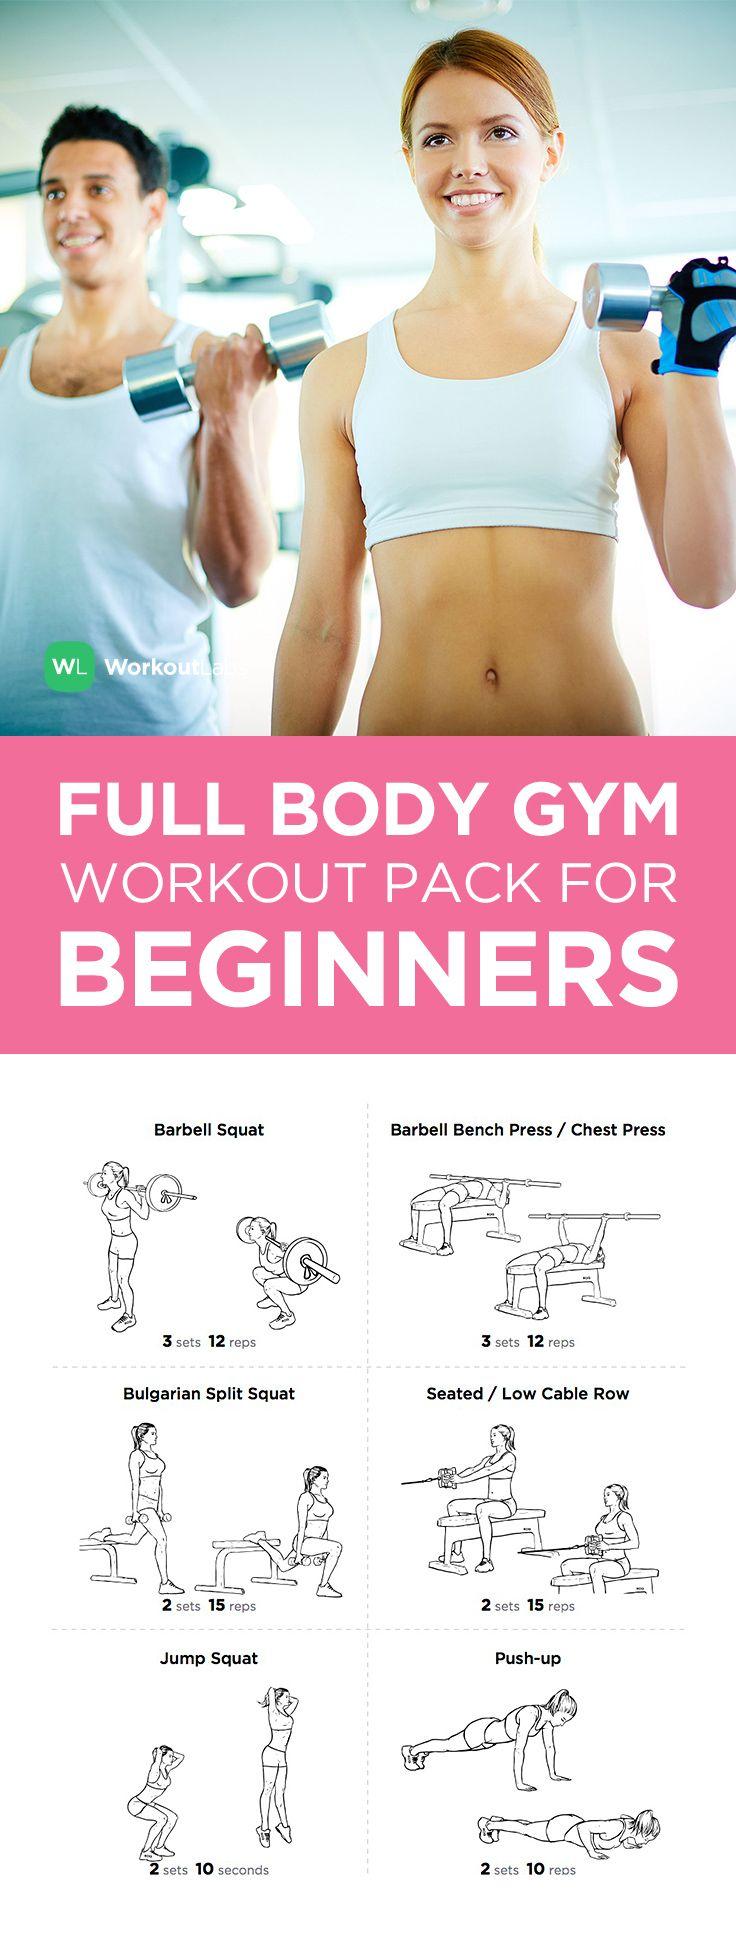 Visit https://WorkoutLabs.com/workout-packs/full-body-gym-workout-pack-for-beginners-men-women to download this Full Body Gym Workout Pack for Beginners